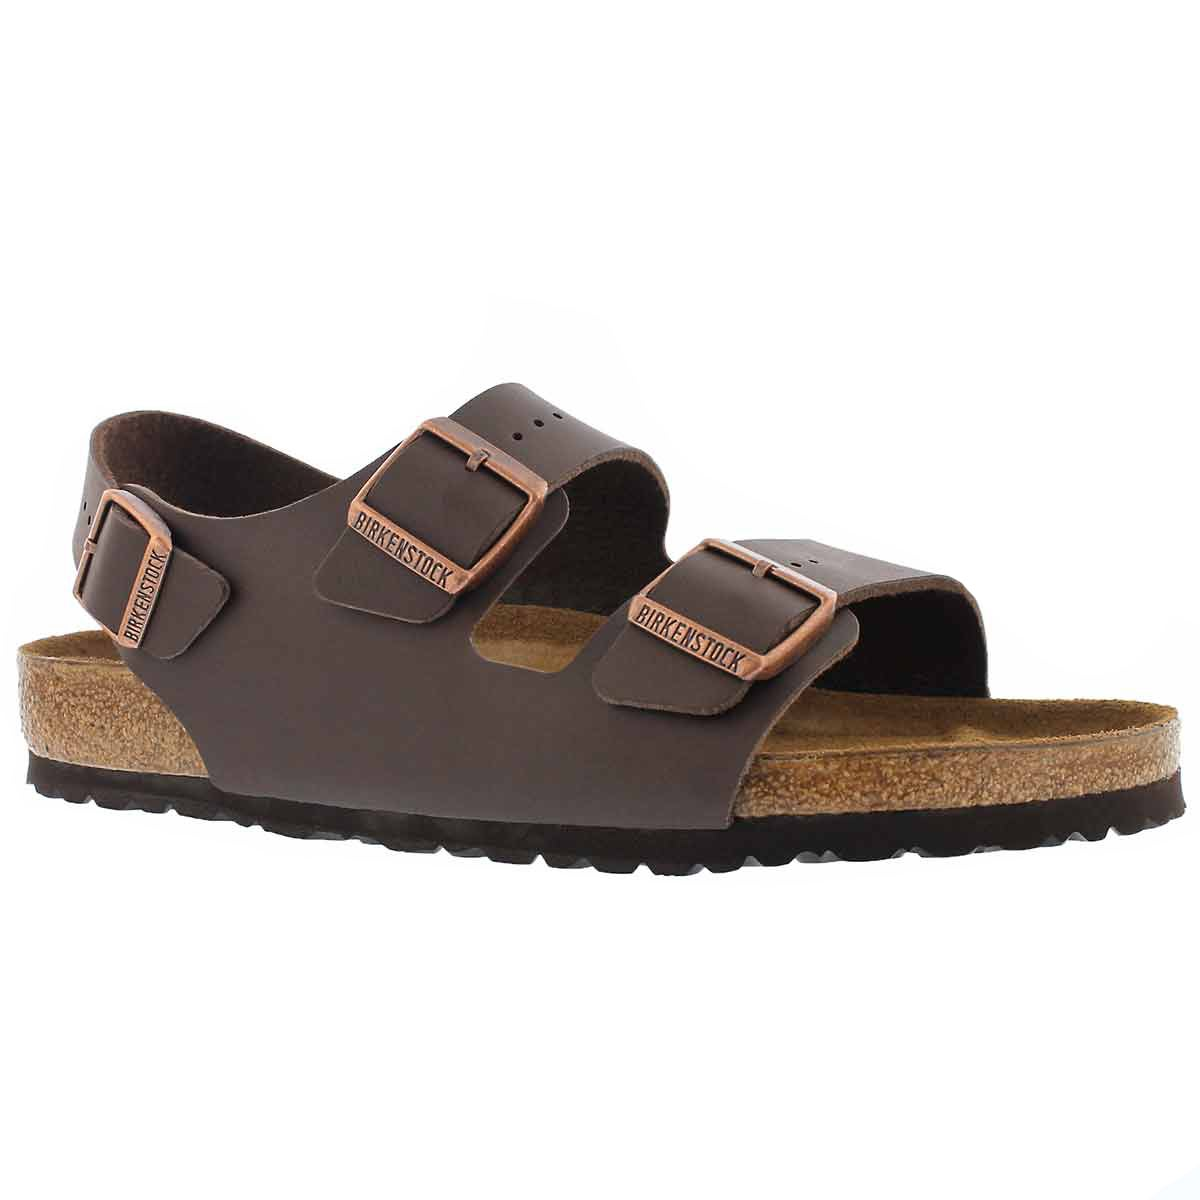 Men's MILANO BF brown 3 strap sandals